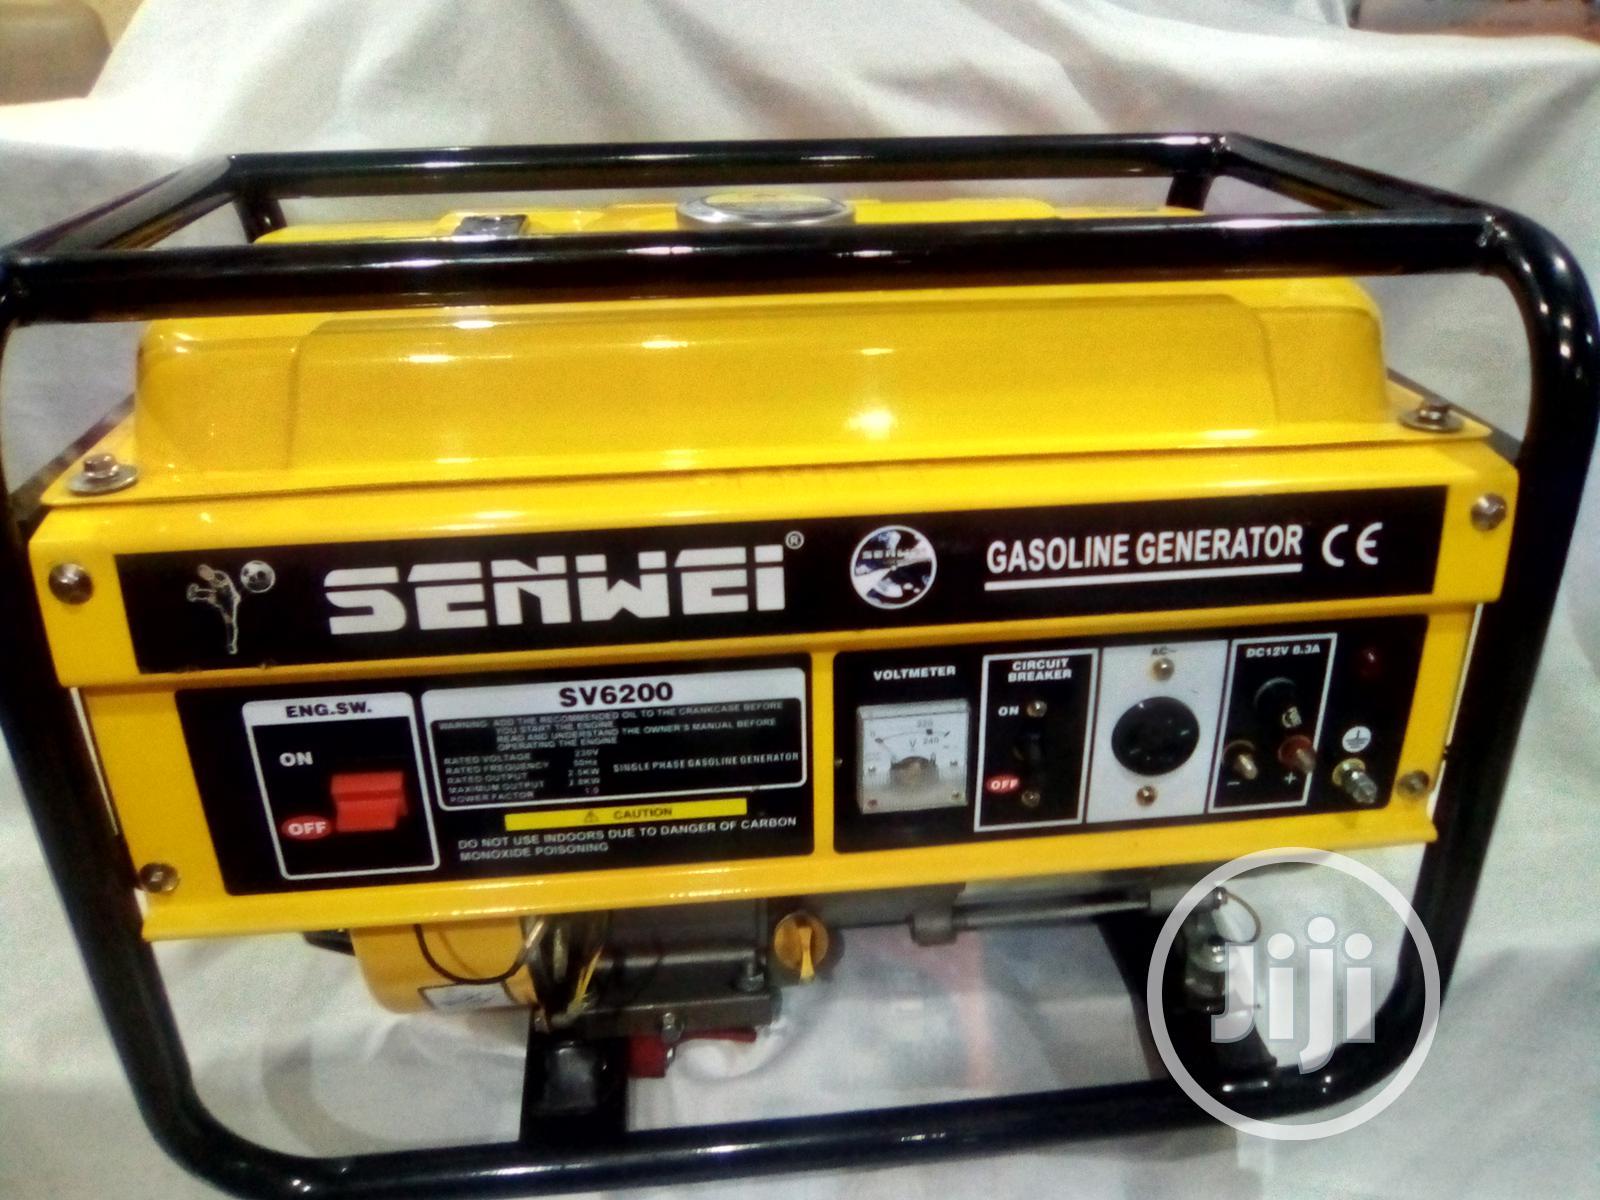 SENWEI Generator Original Quality And Pure Cooper | Electrical Equipment for sale in Ikwerre, Rivers State, Nigeria